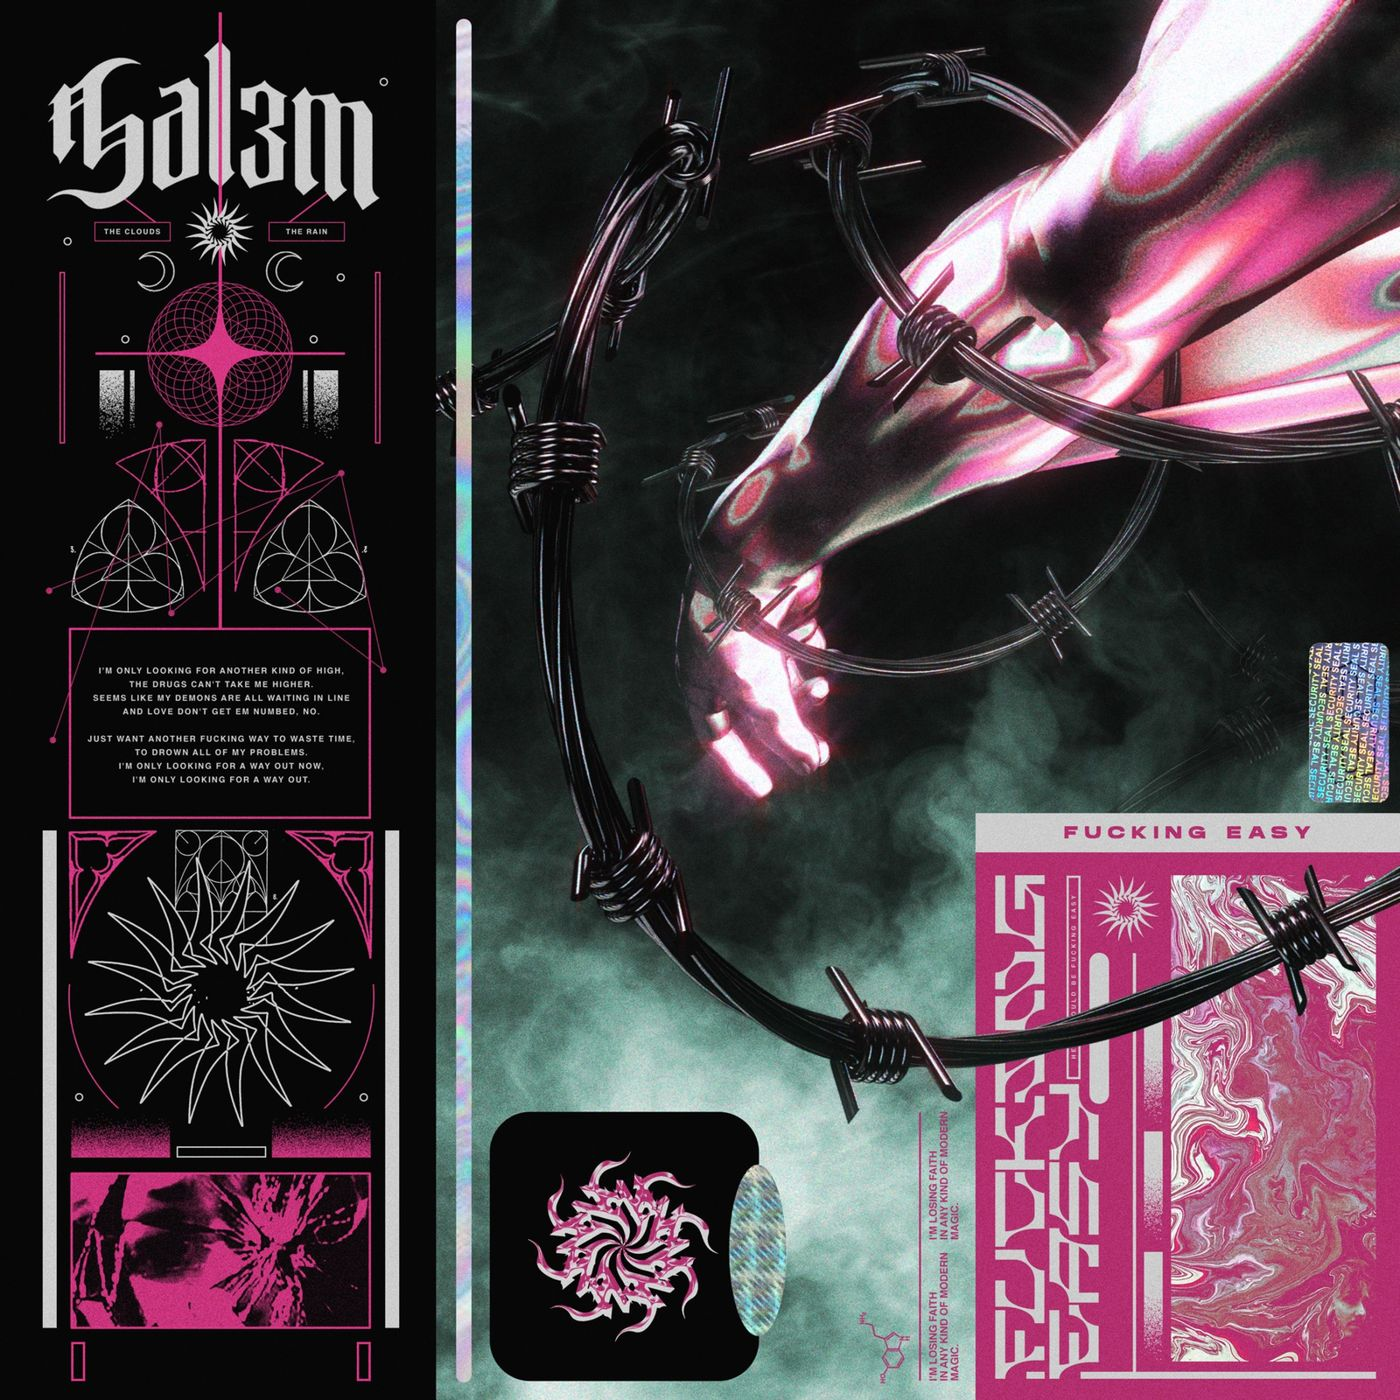 Sal3m - Fucking Easy [single] (2021)